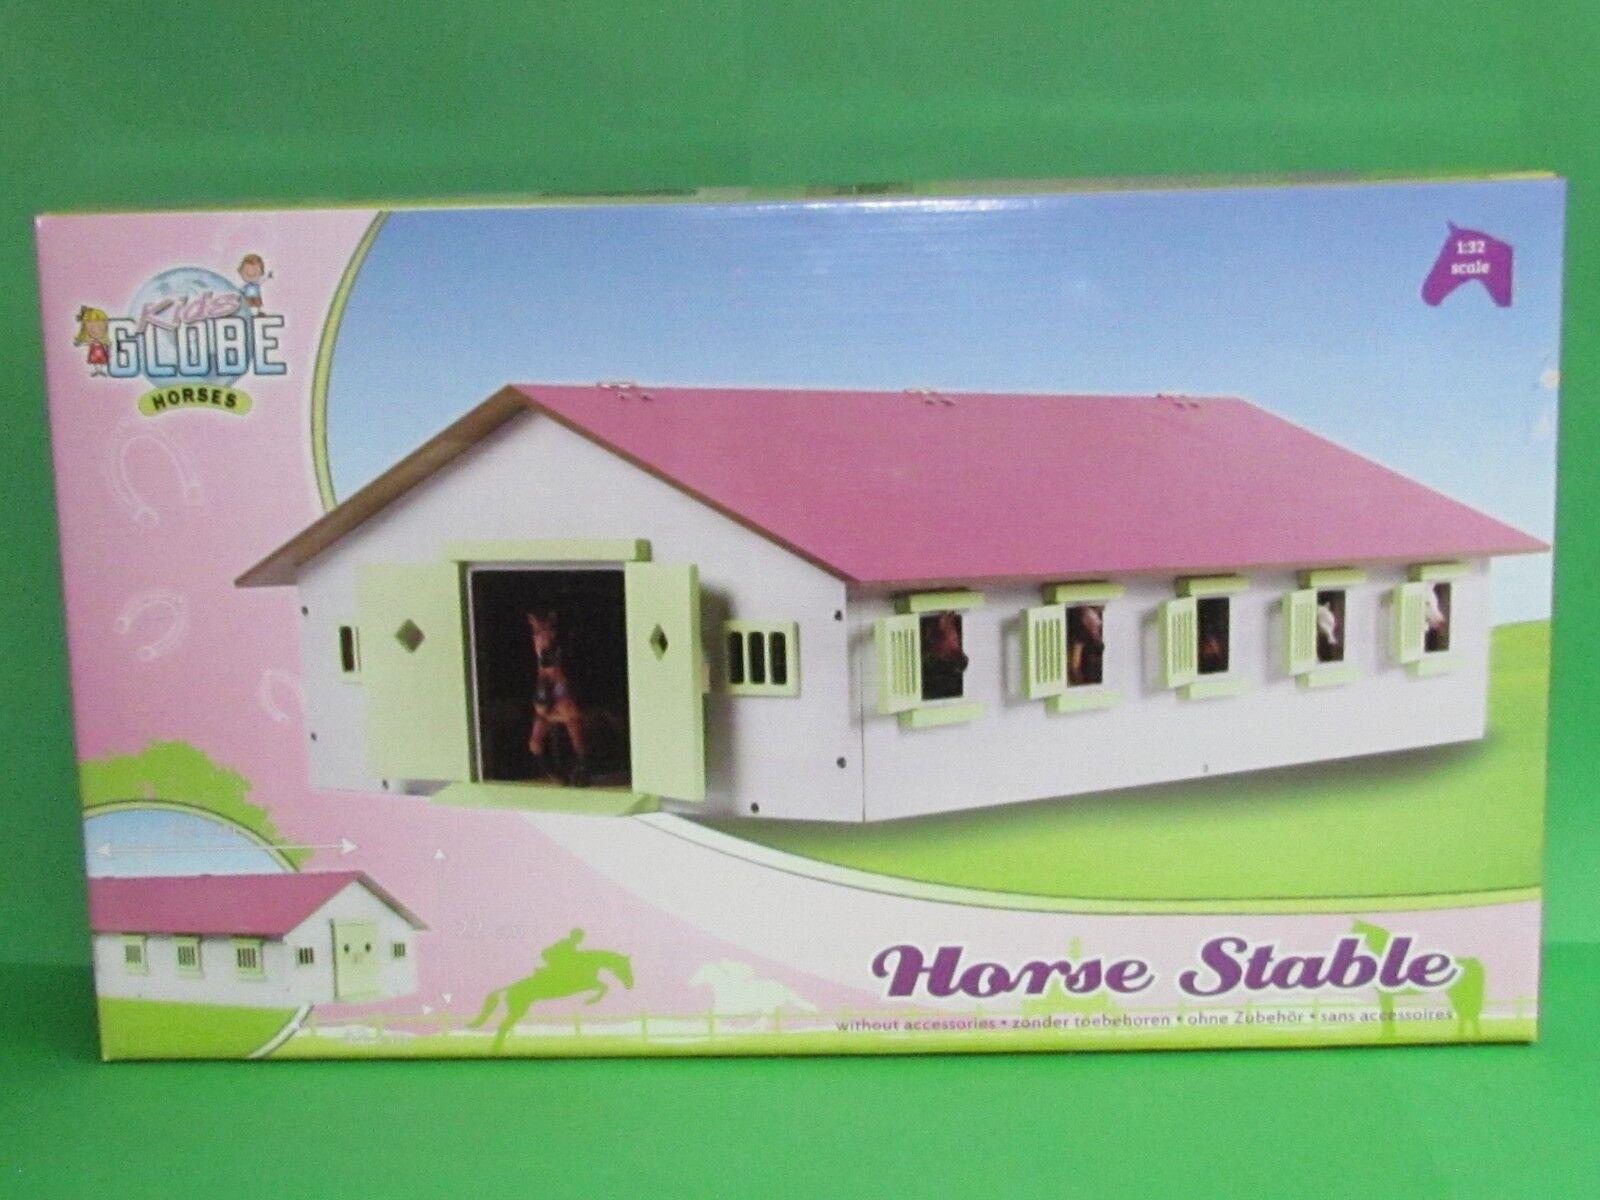 1 32 Kids Globe 610188 Pferdestall mit 9 Boxen Rosa Dach Blitzversand DHL-Paket